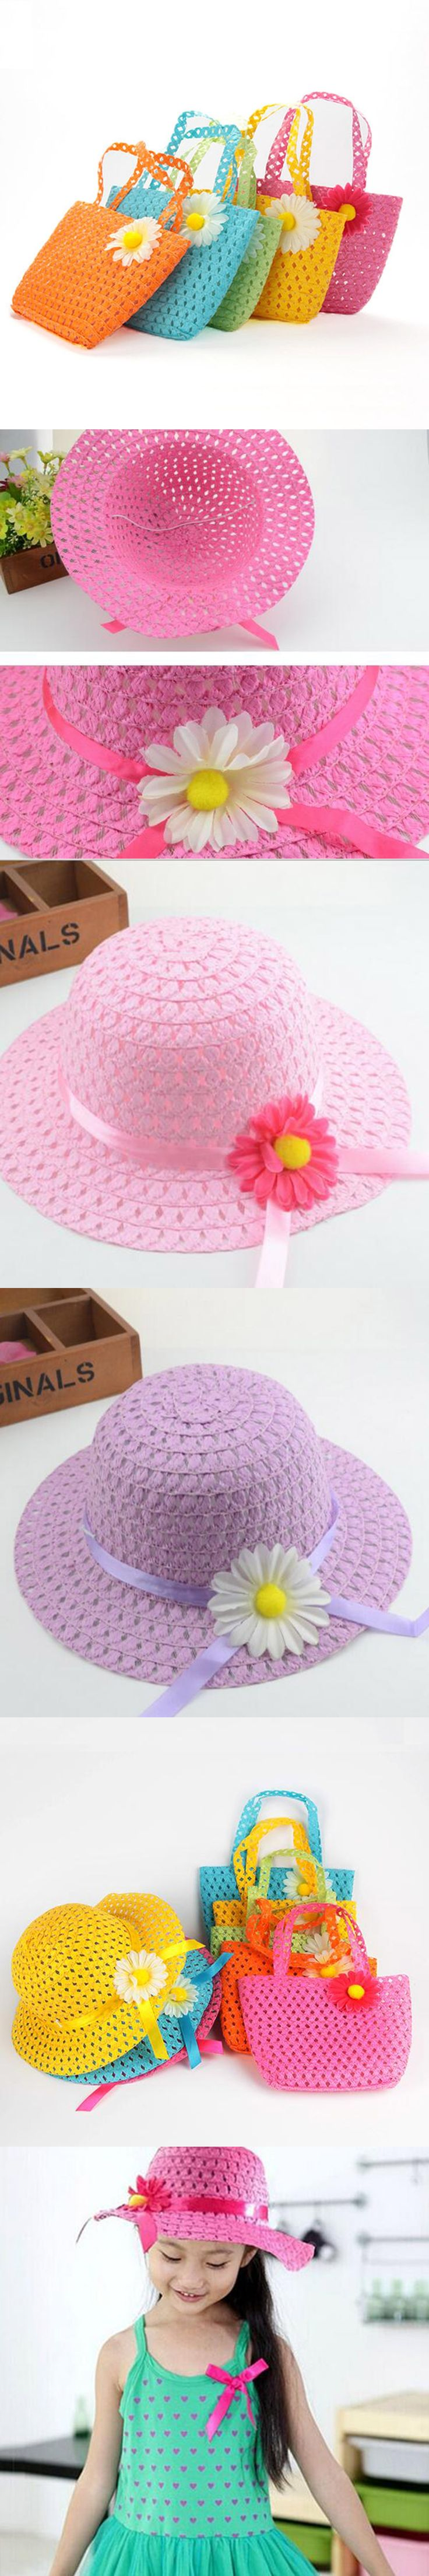 2017 Girls Beach Hats Bags Flower Straw Hat Cap Tote Handbag Bag Suit Children Summer Sun Hat 52 CM For 3-7 Years 9 Colors